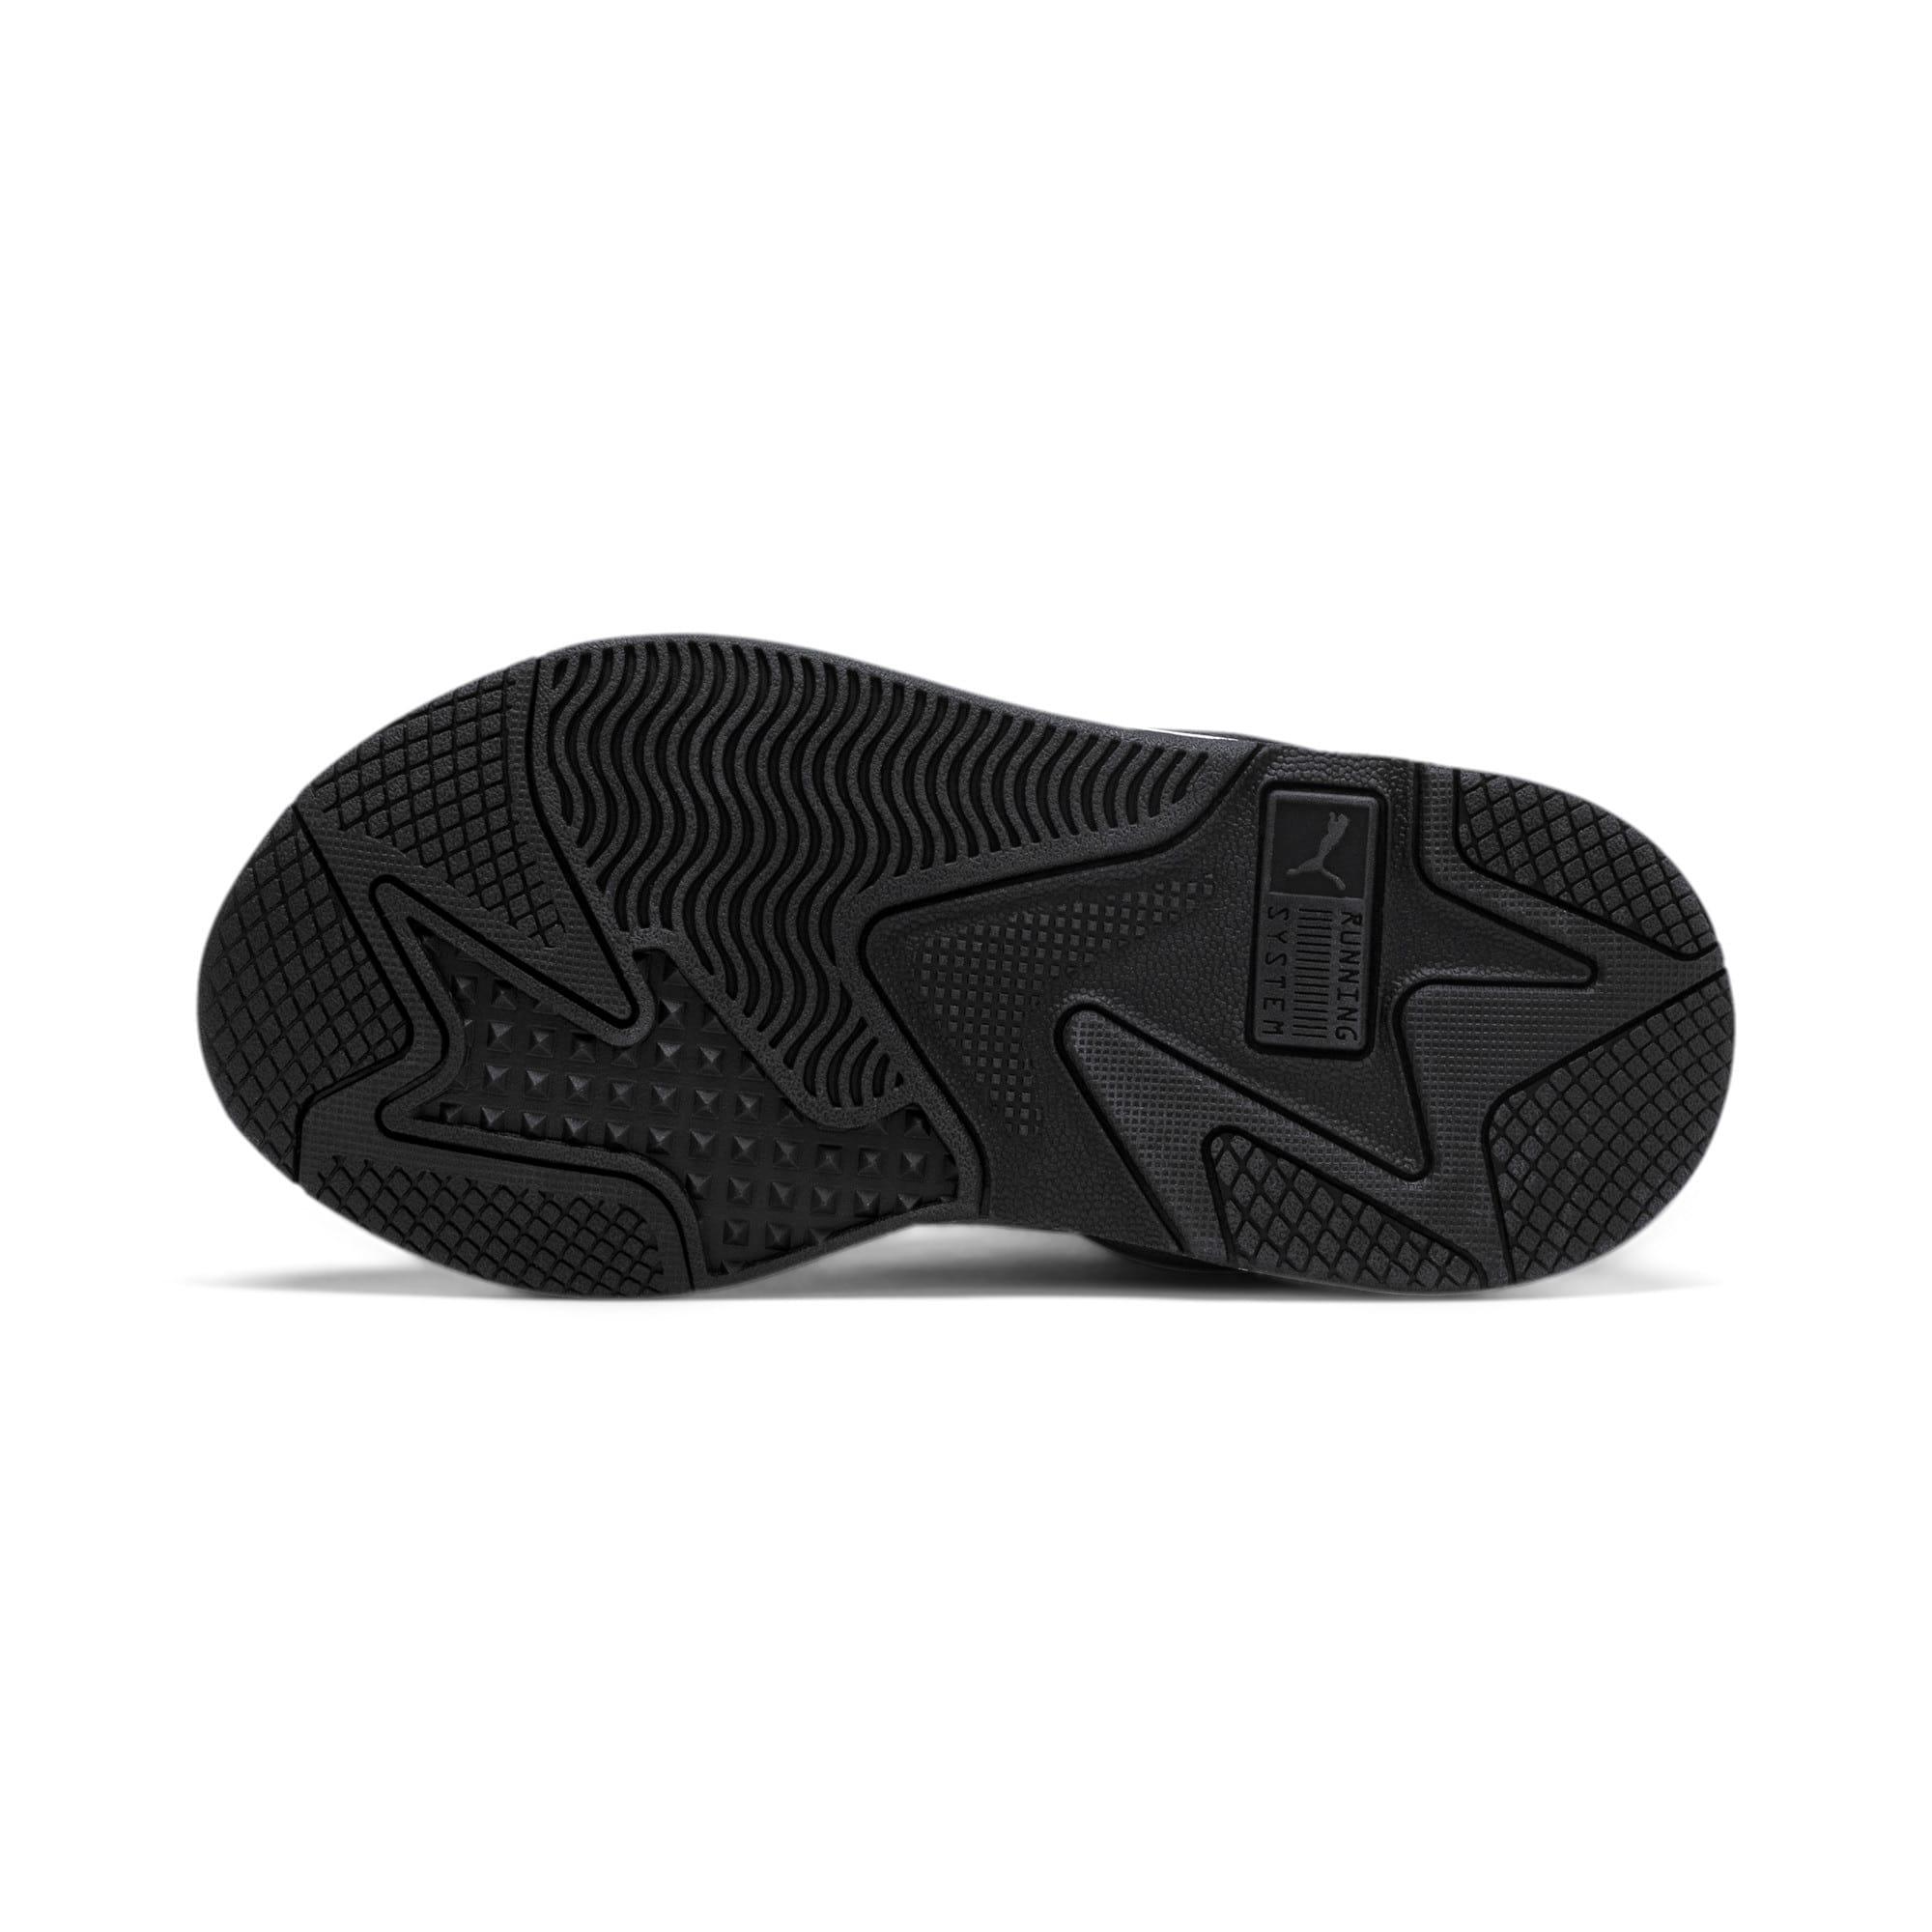 Miniatura 4 de Zapatos RS-X Hard Drive para niño pequeño, High Rise-Yellow Alert, mediano